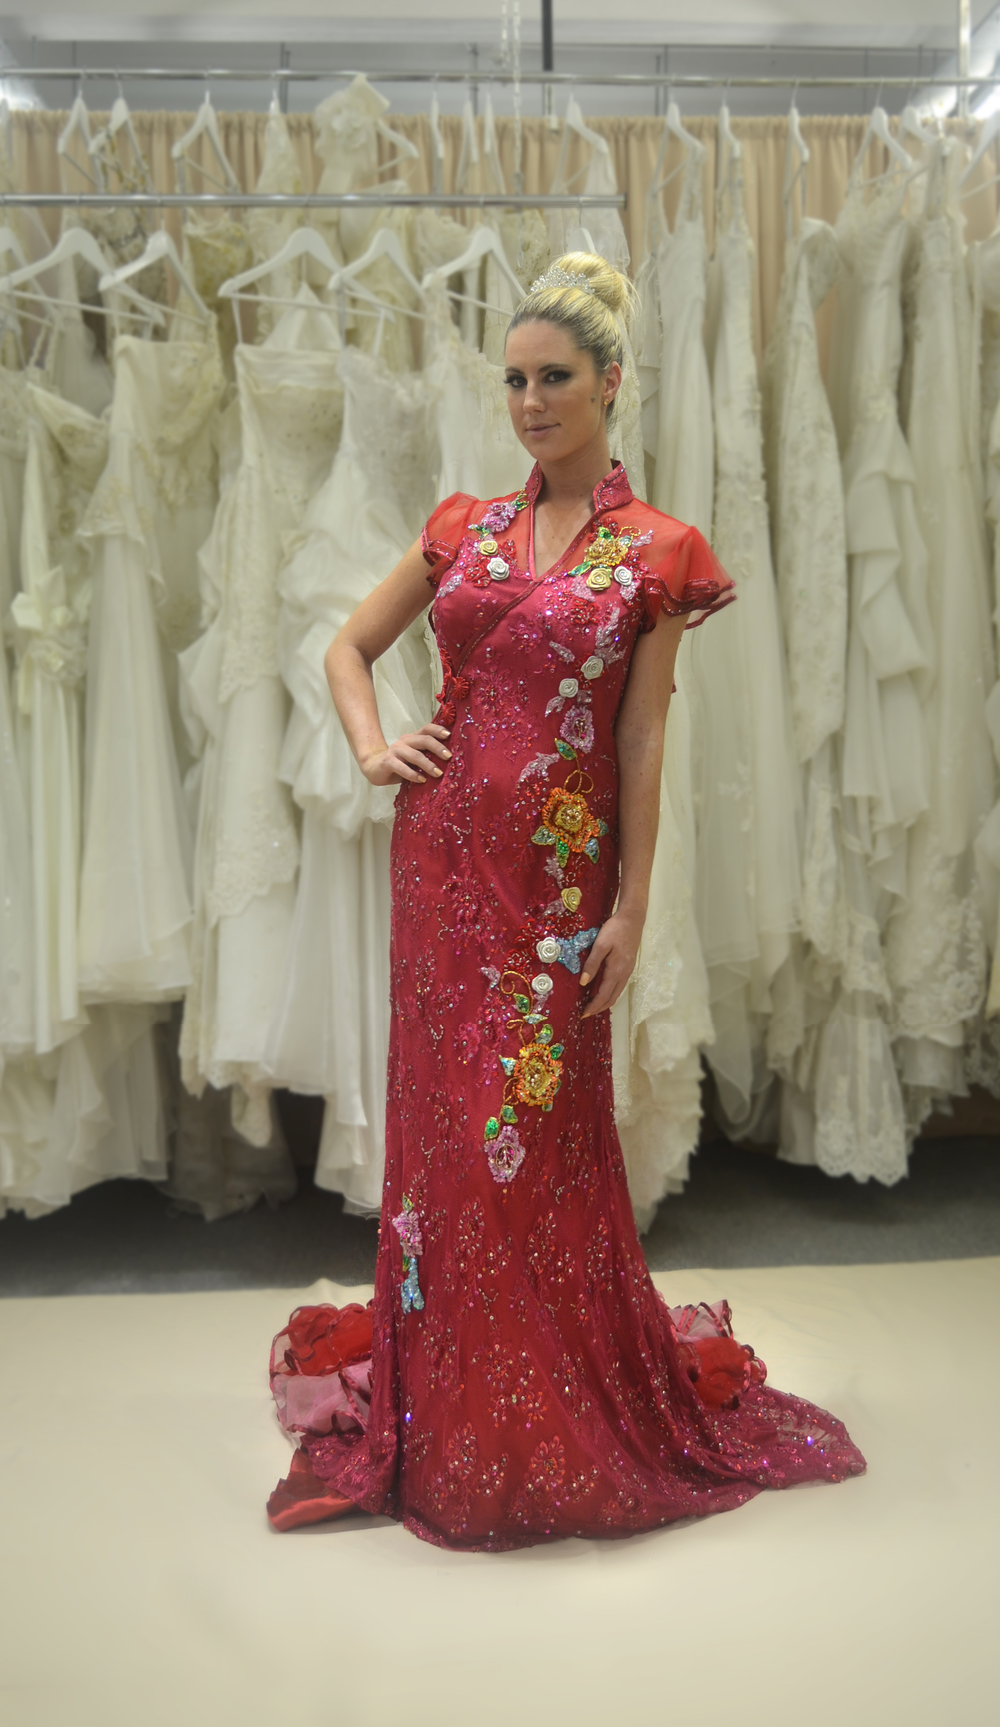 Unique Brisbane wear, wedding dresses, formal dresses, custom made bridal dresses in Brisbane.